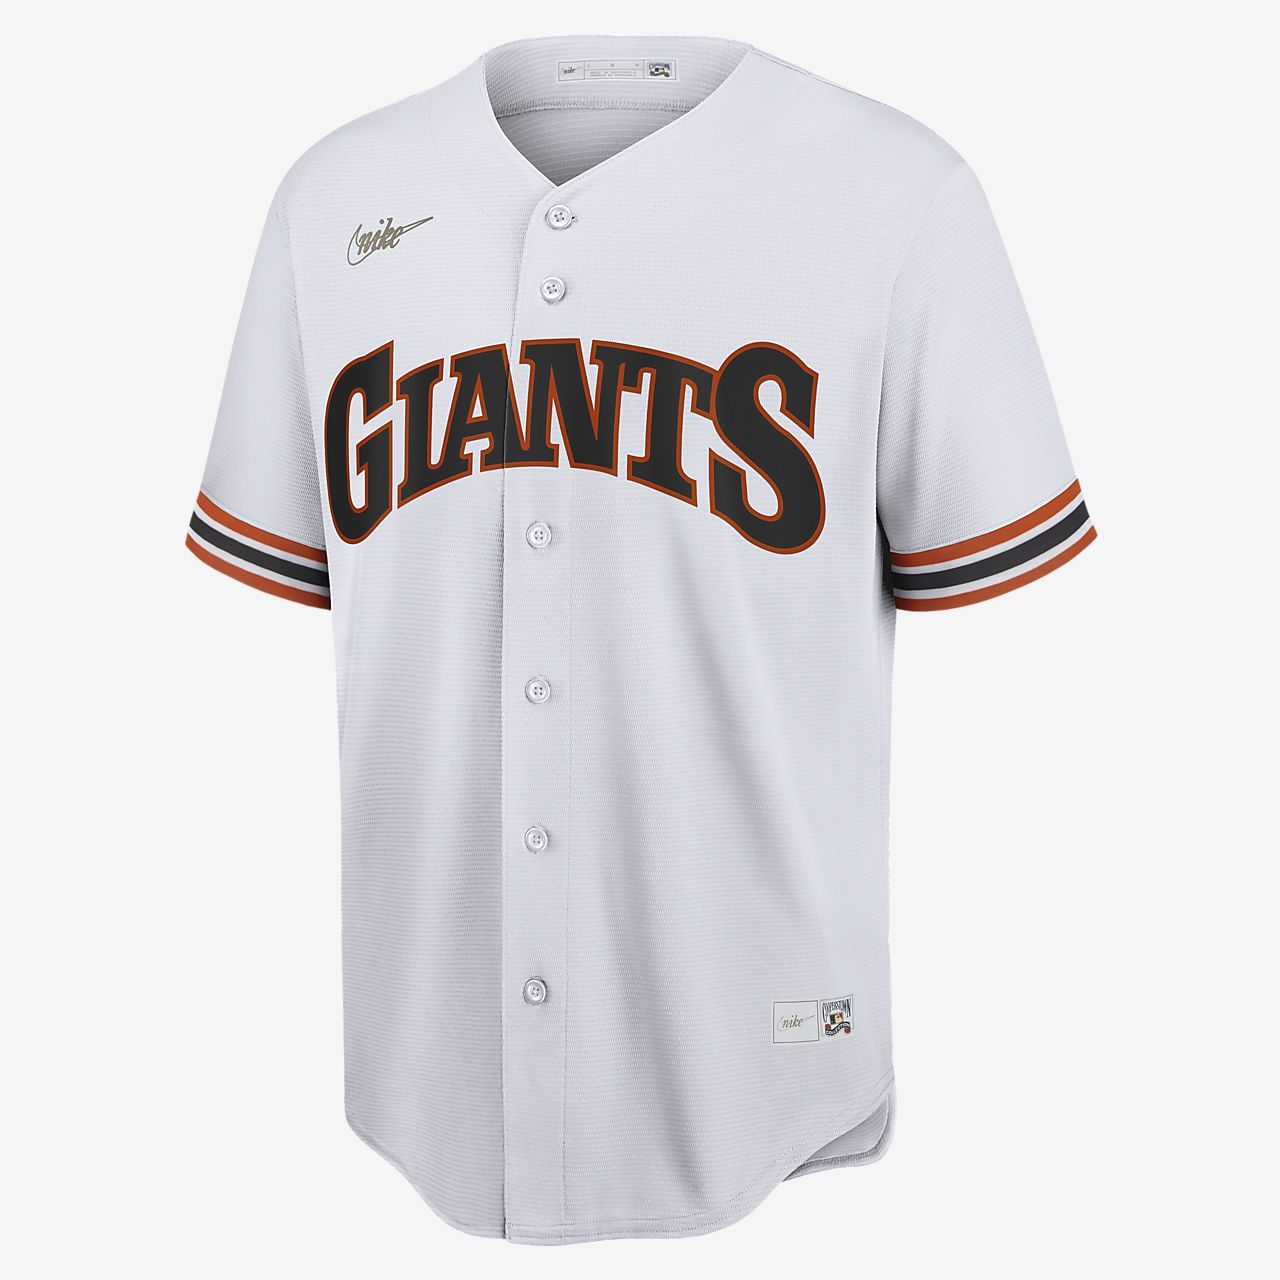 MLB San Francisco Giants (Will Clark) Men's Cooperstown Baseball Jersey